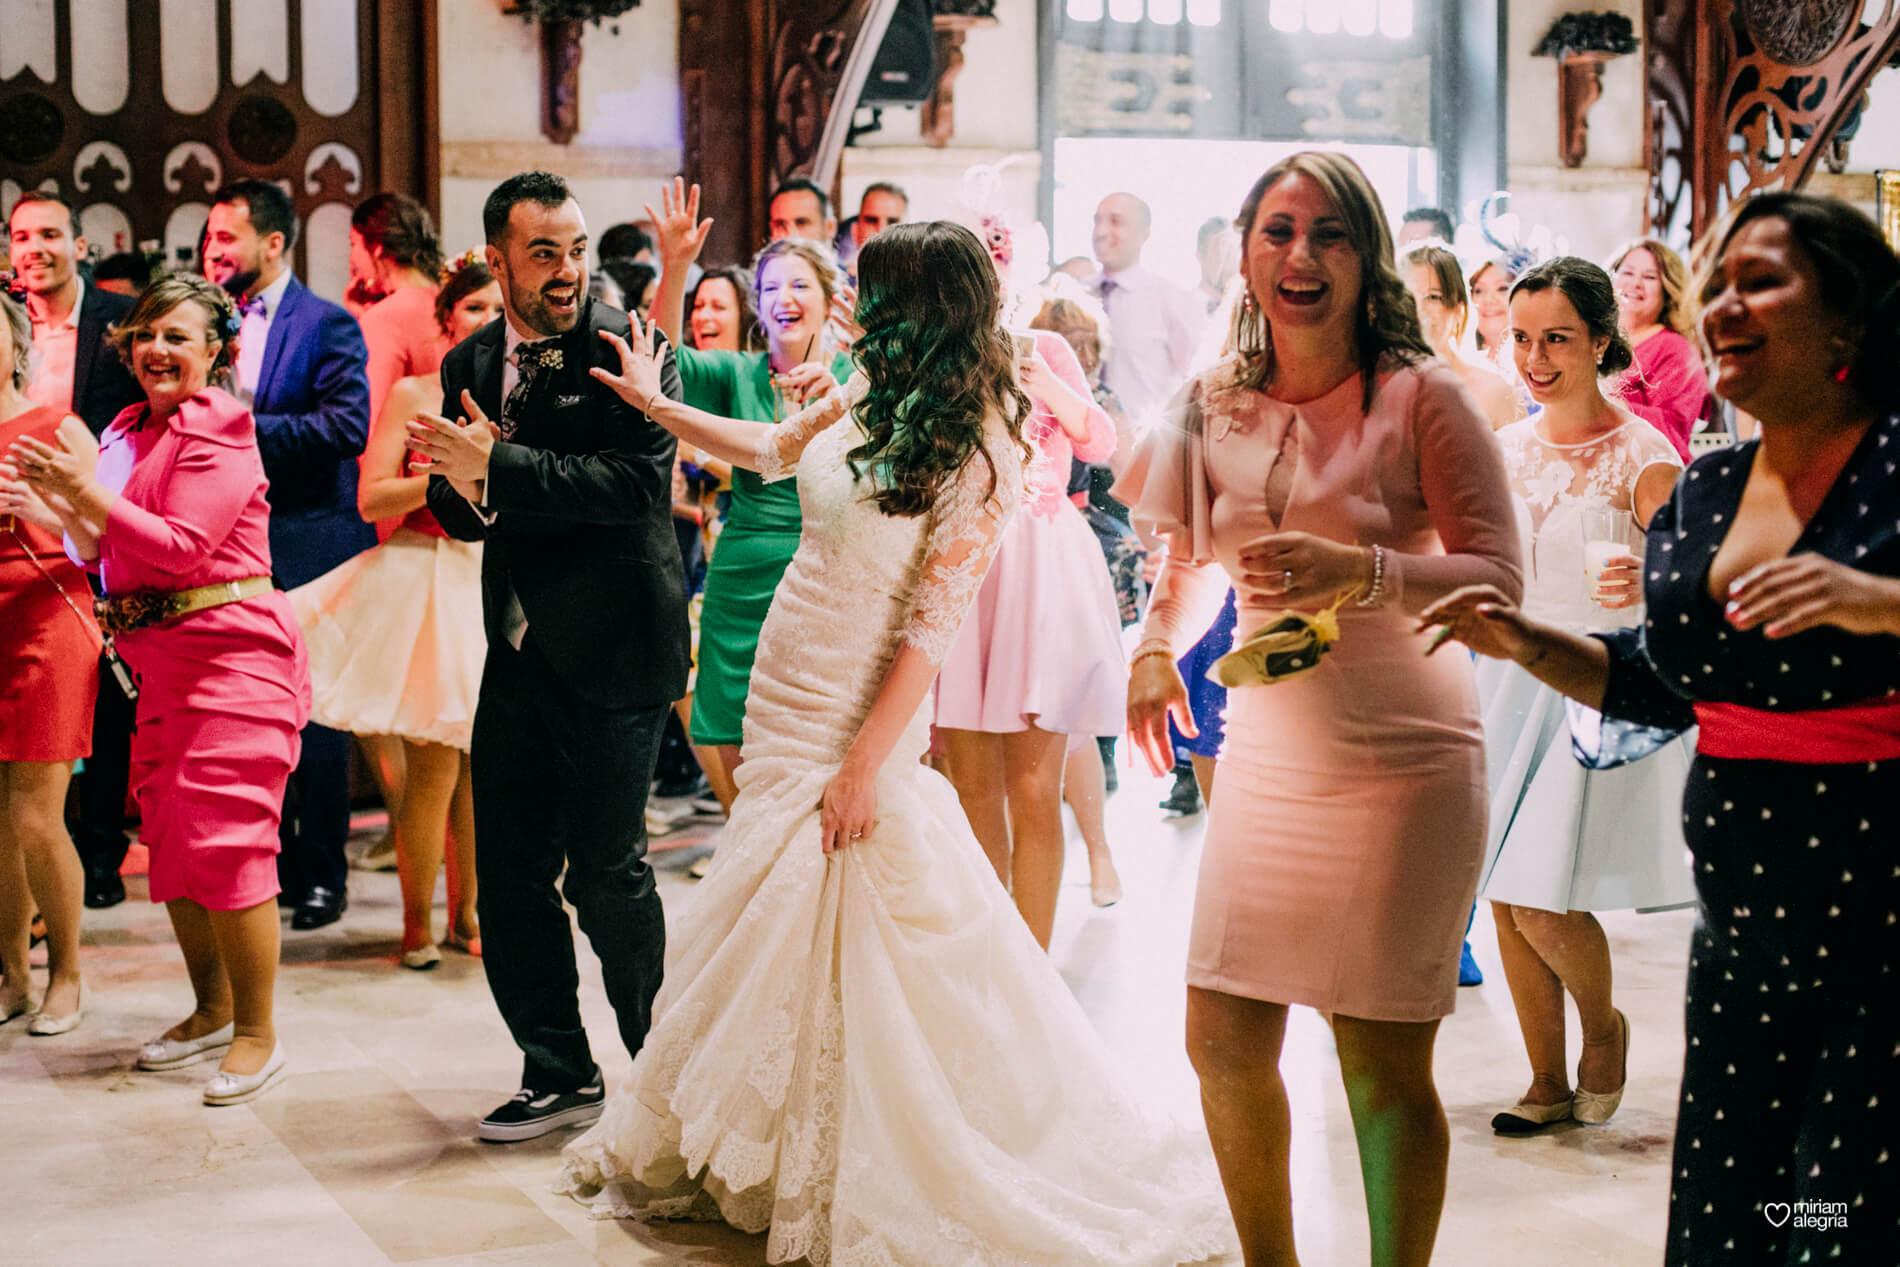 boda-en-finca-jurosa-miriam-alegria-142